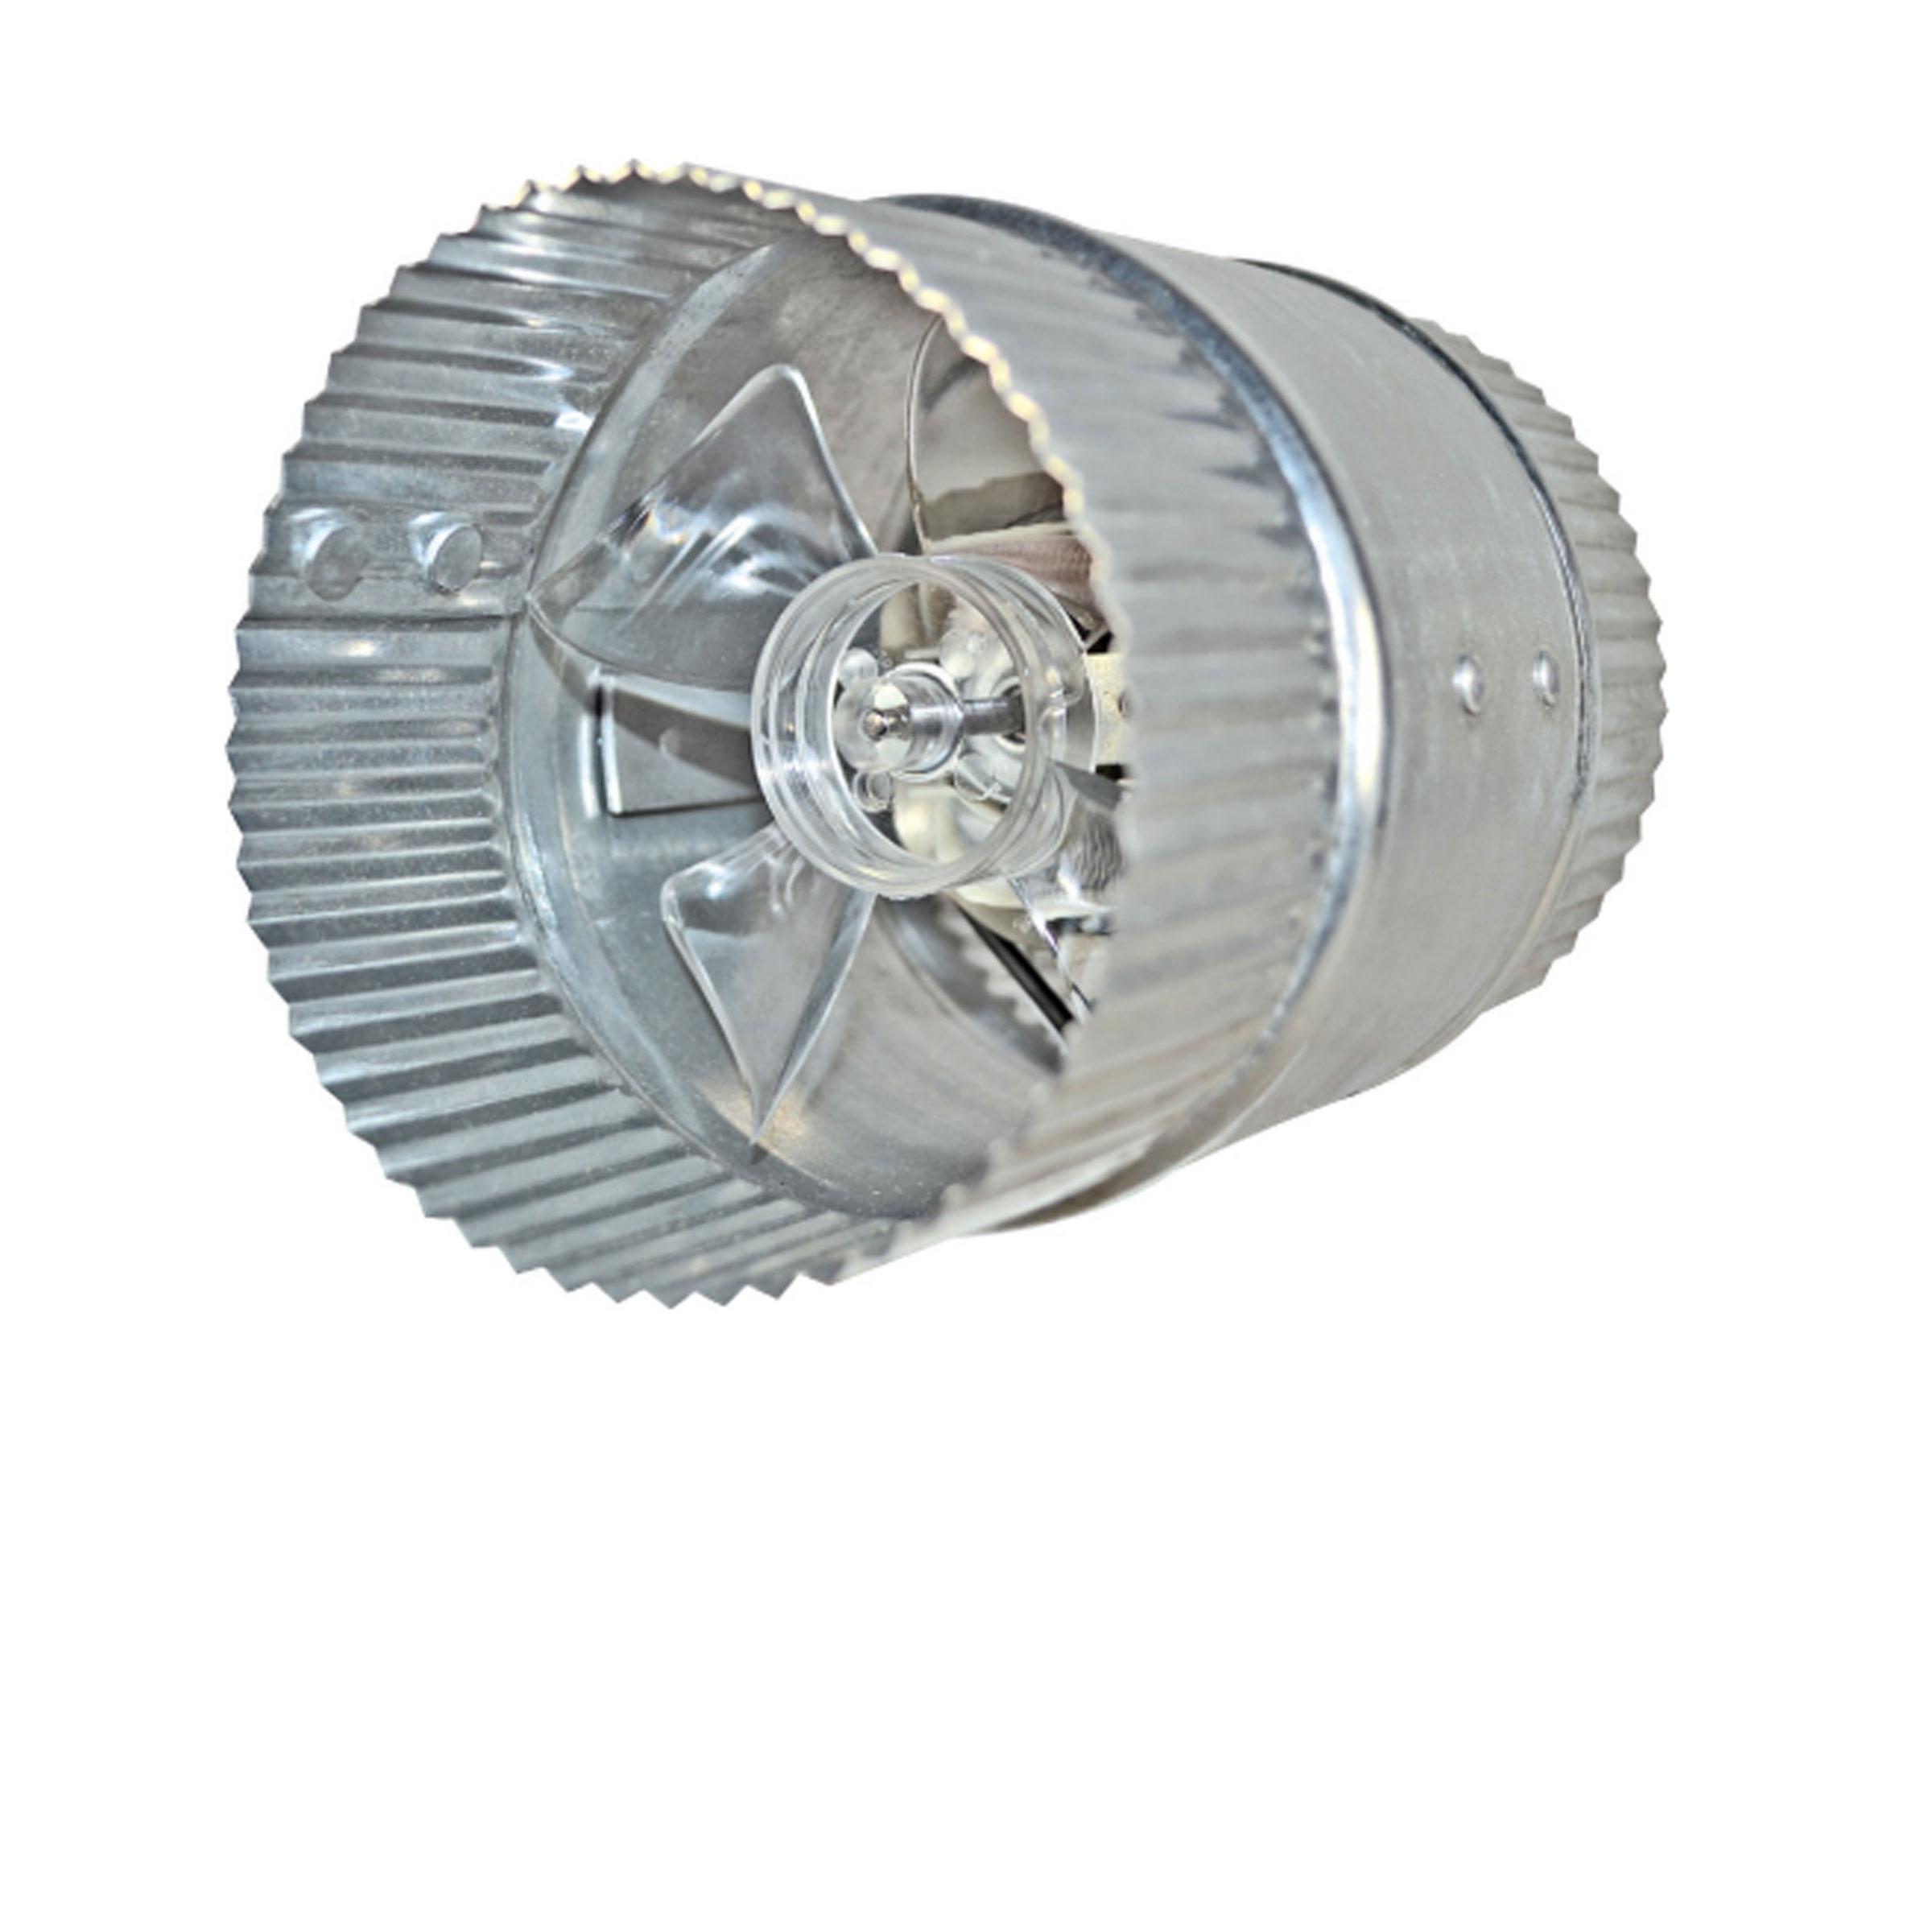 Inductor Inline Duct Fan Inductor® In line Duct Fan™ #5B6970